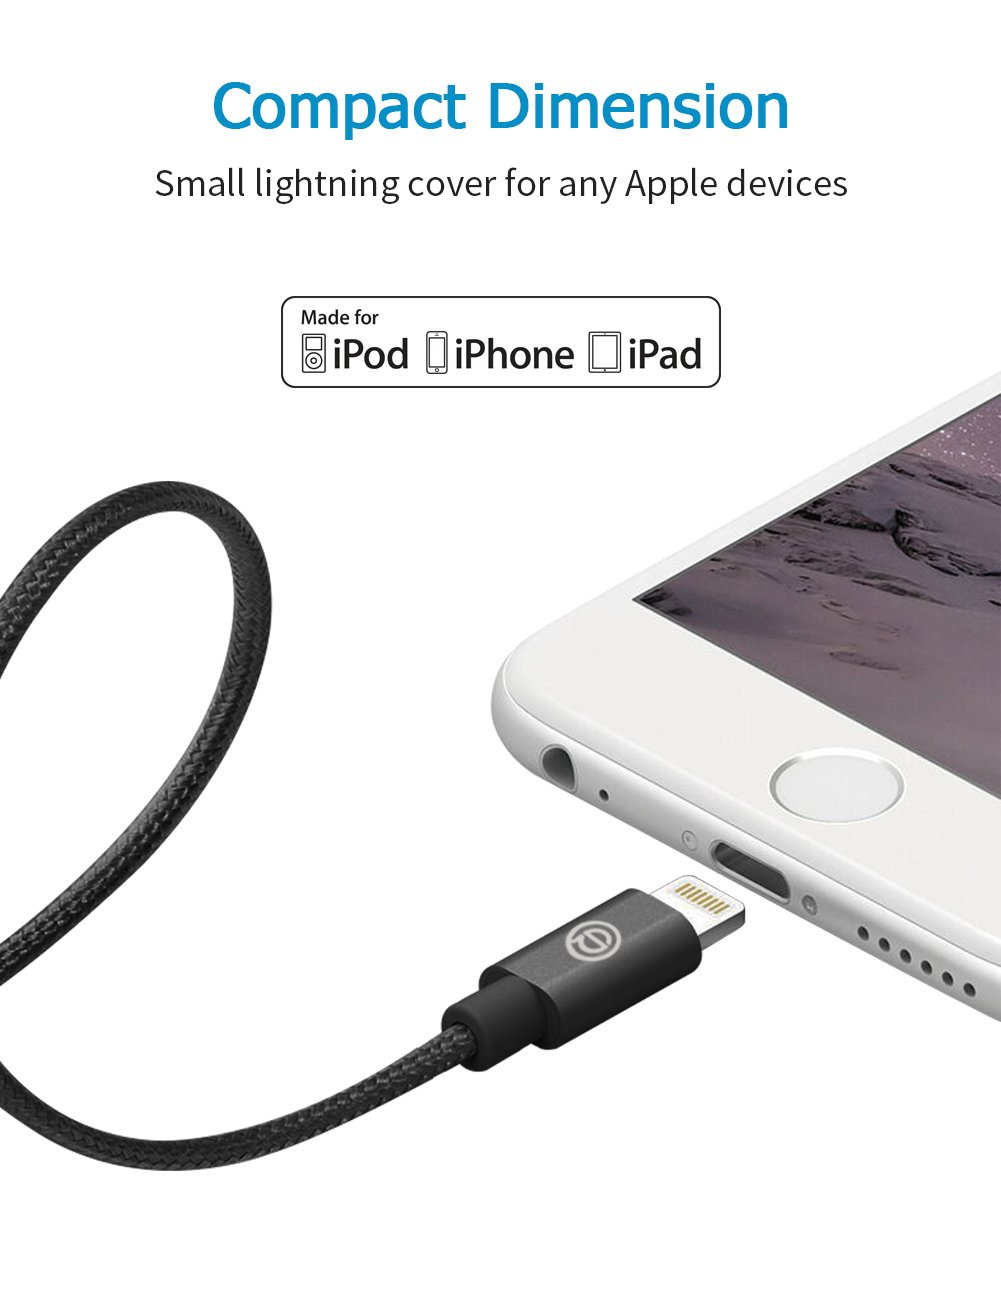 USB Cargador Cable OPSO Lightning Nailon Trenzado 1M [Certificato Apple MFi] para iPhone 7 6s 6 Plus SE 5s, iPad Pro, iPad mini, iPod touch / nano- Negro